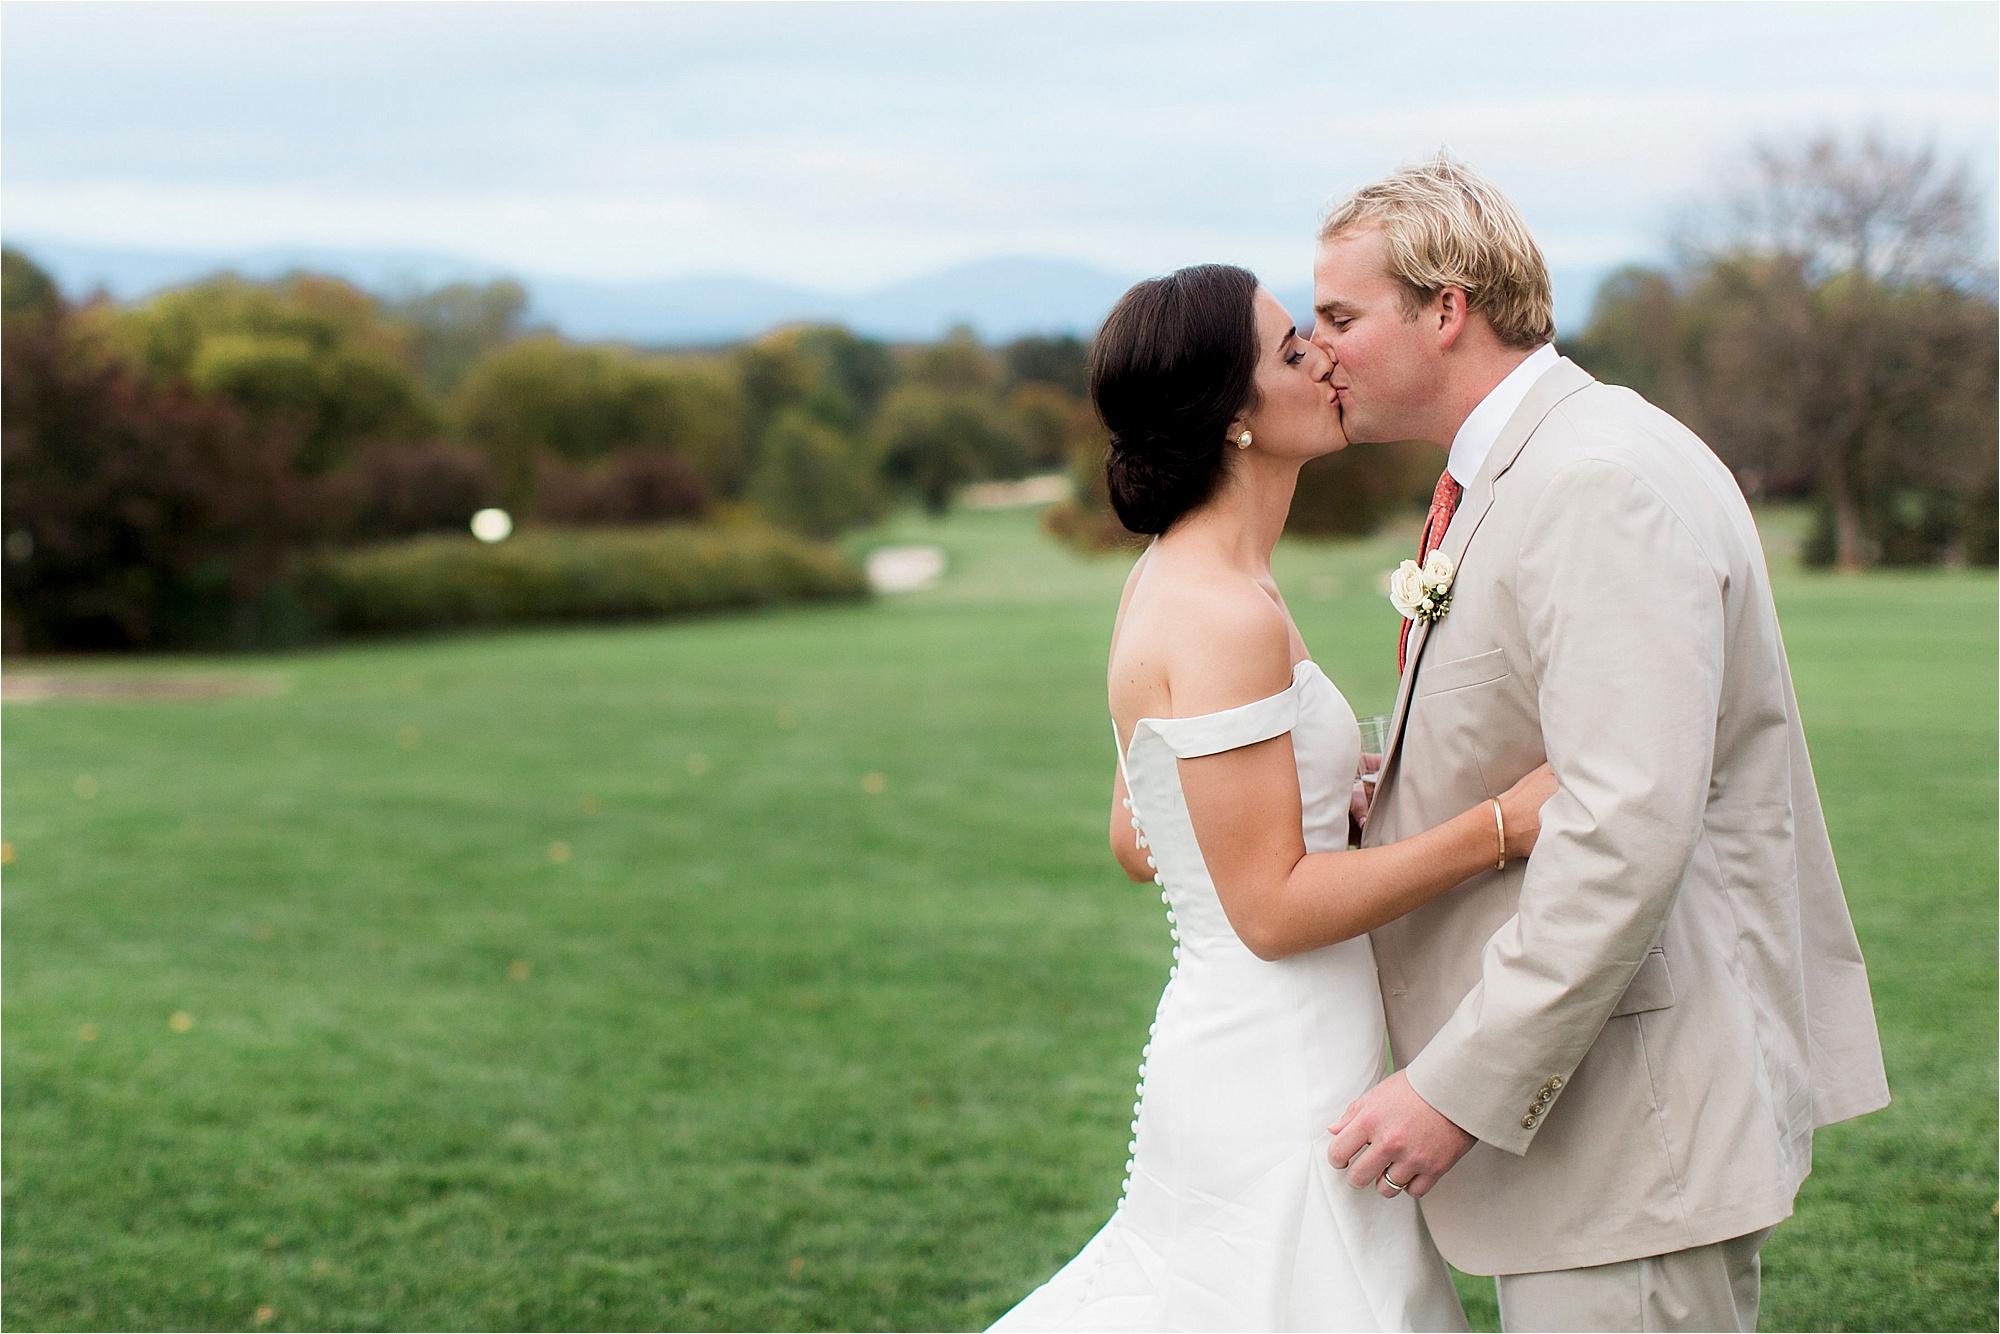 claire-thomas-farmington-country-club-charlottesville-virginia-wedding-photos__0067.jpg